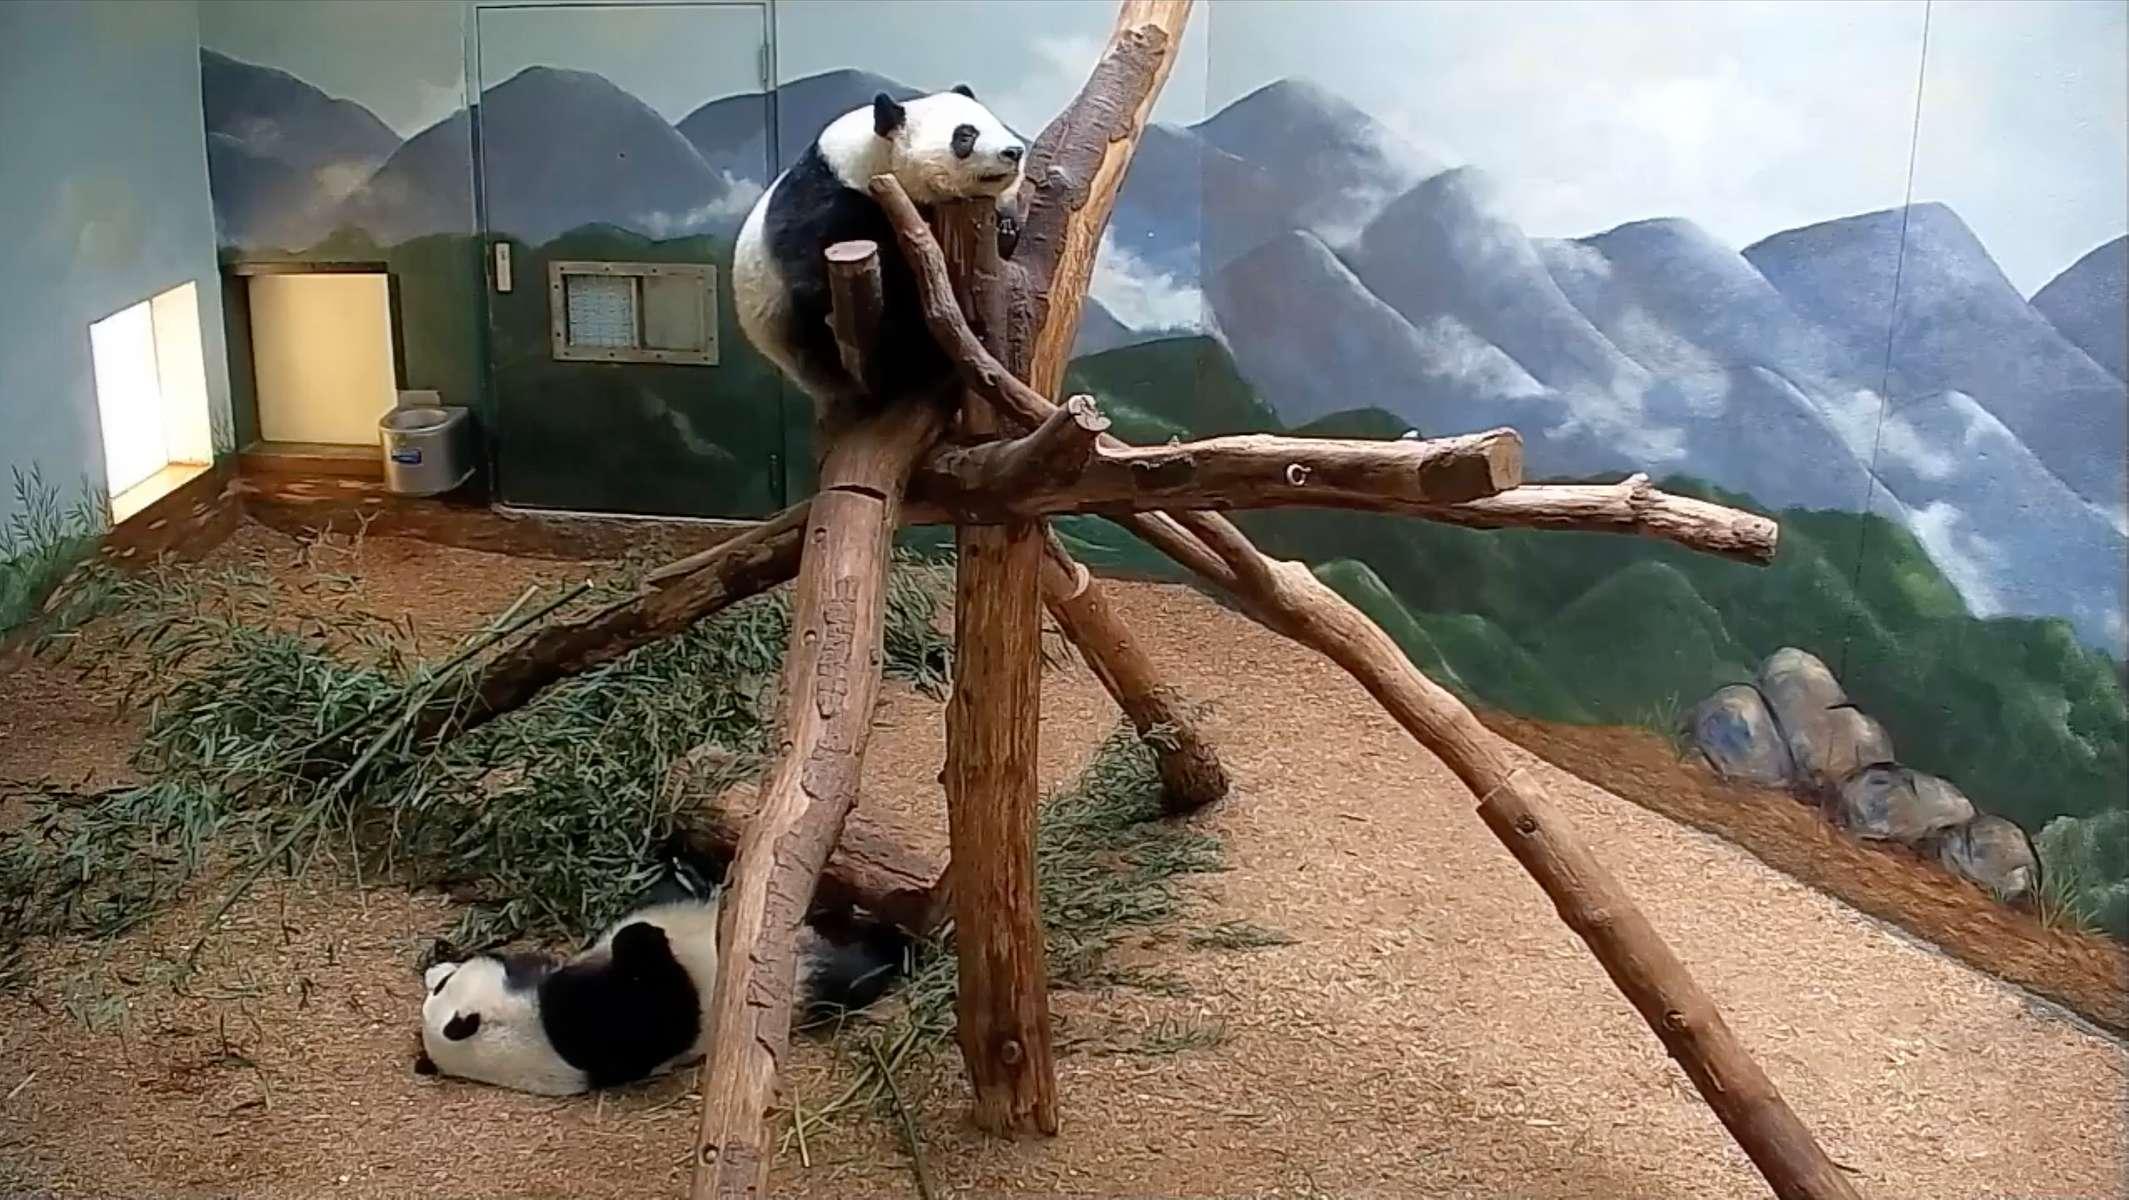 Pandas, Atlanta Zoo, Georgia. April 28, 2020, 7:08:26 AM PST